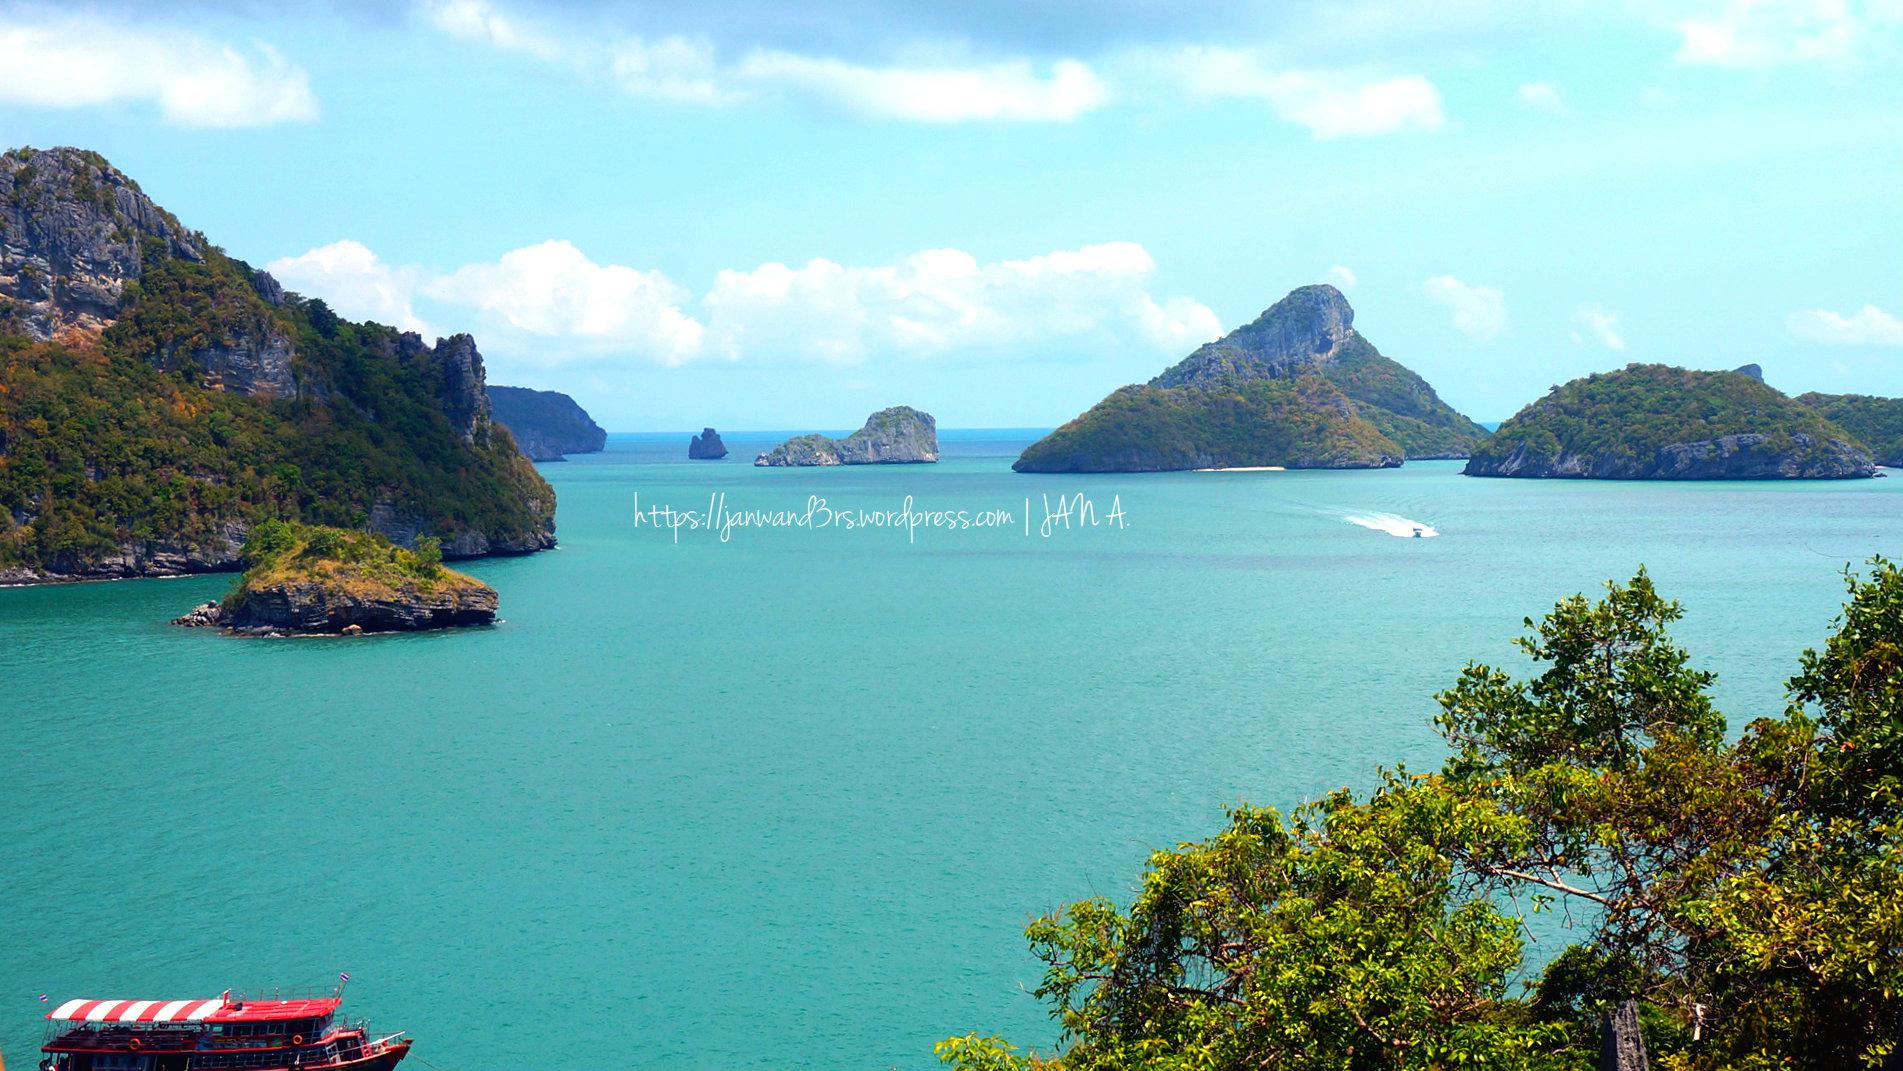 Koh Samui , Thailand: Ang Thong National Marine Park Tour – janwand3rs